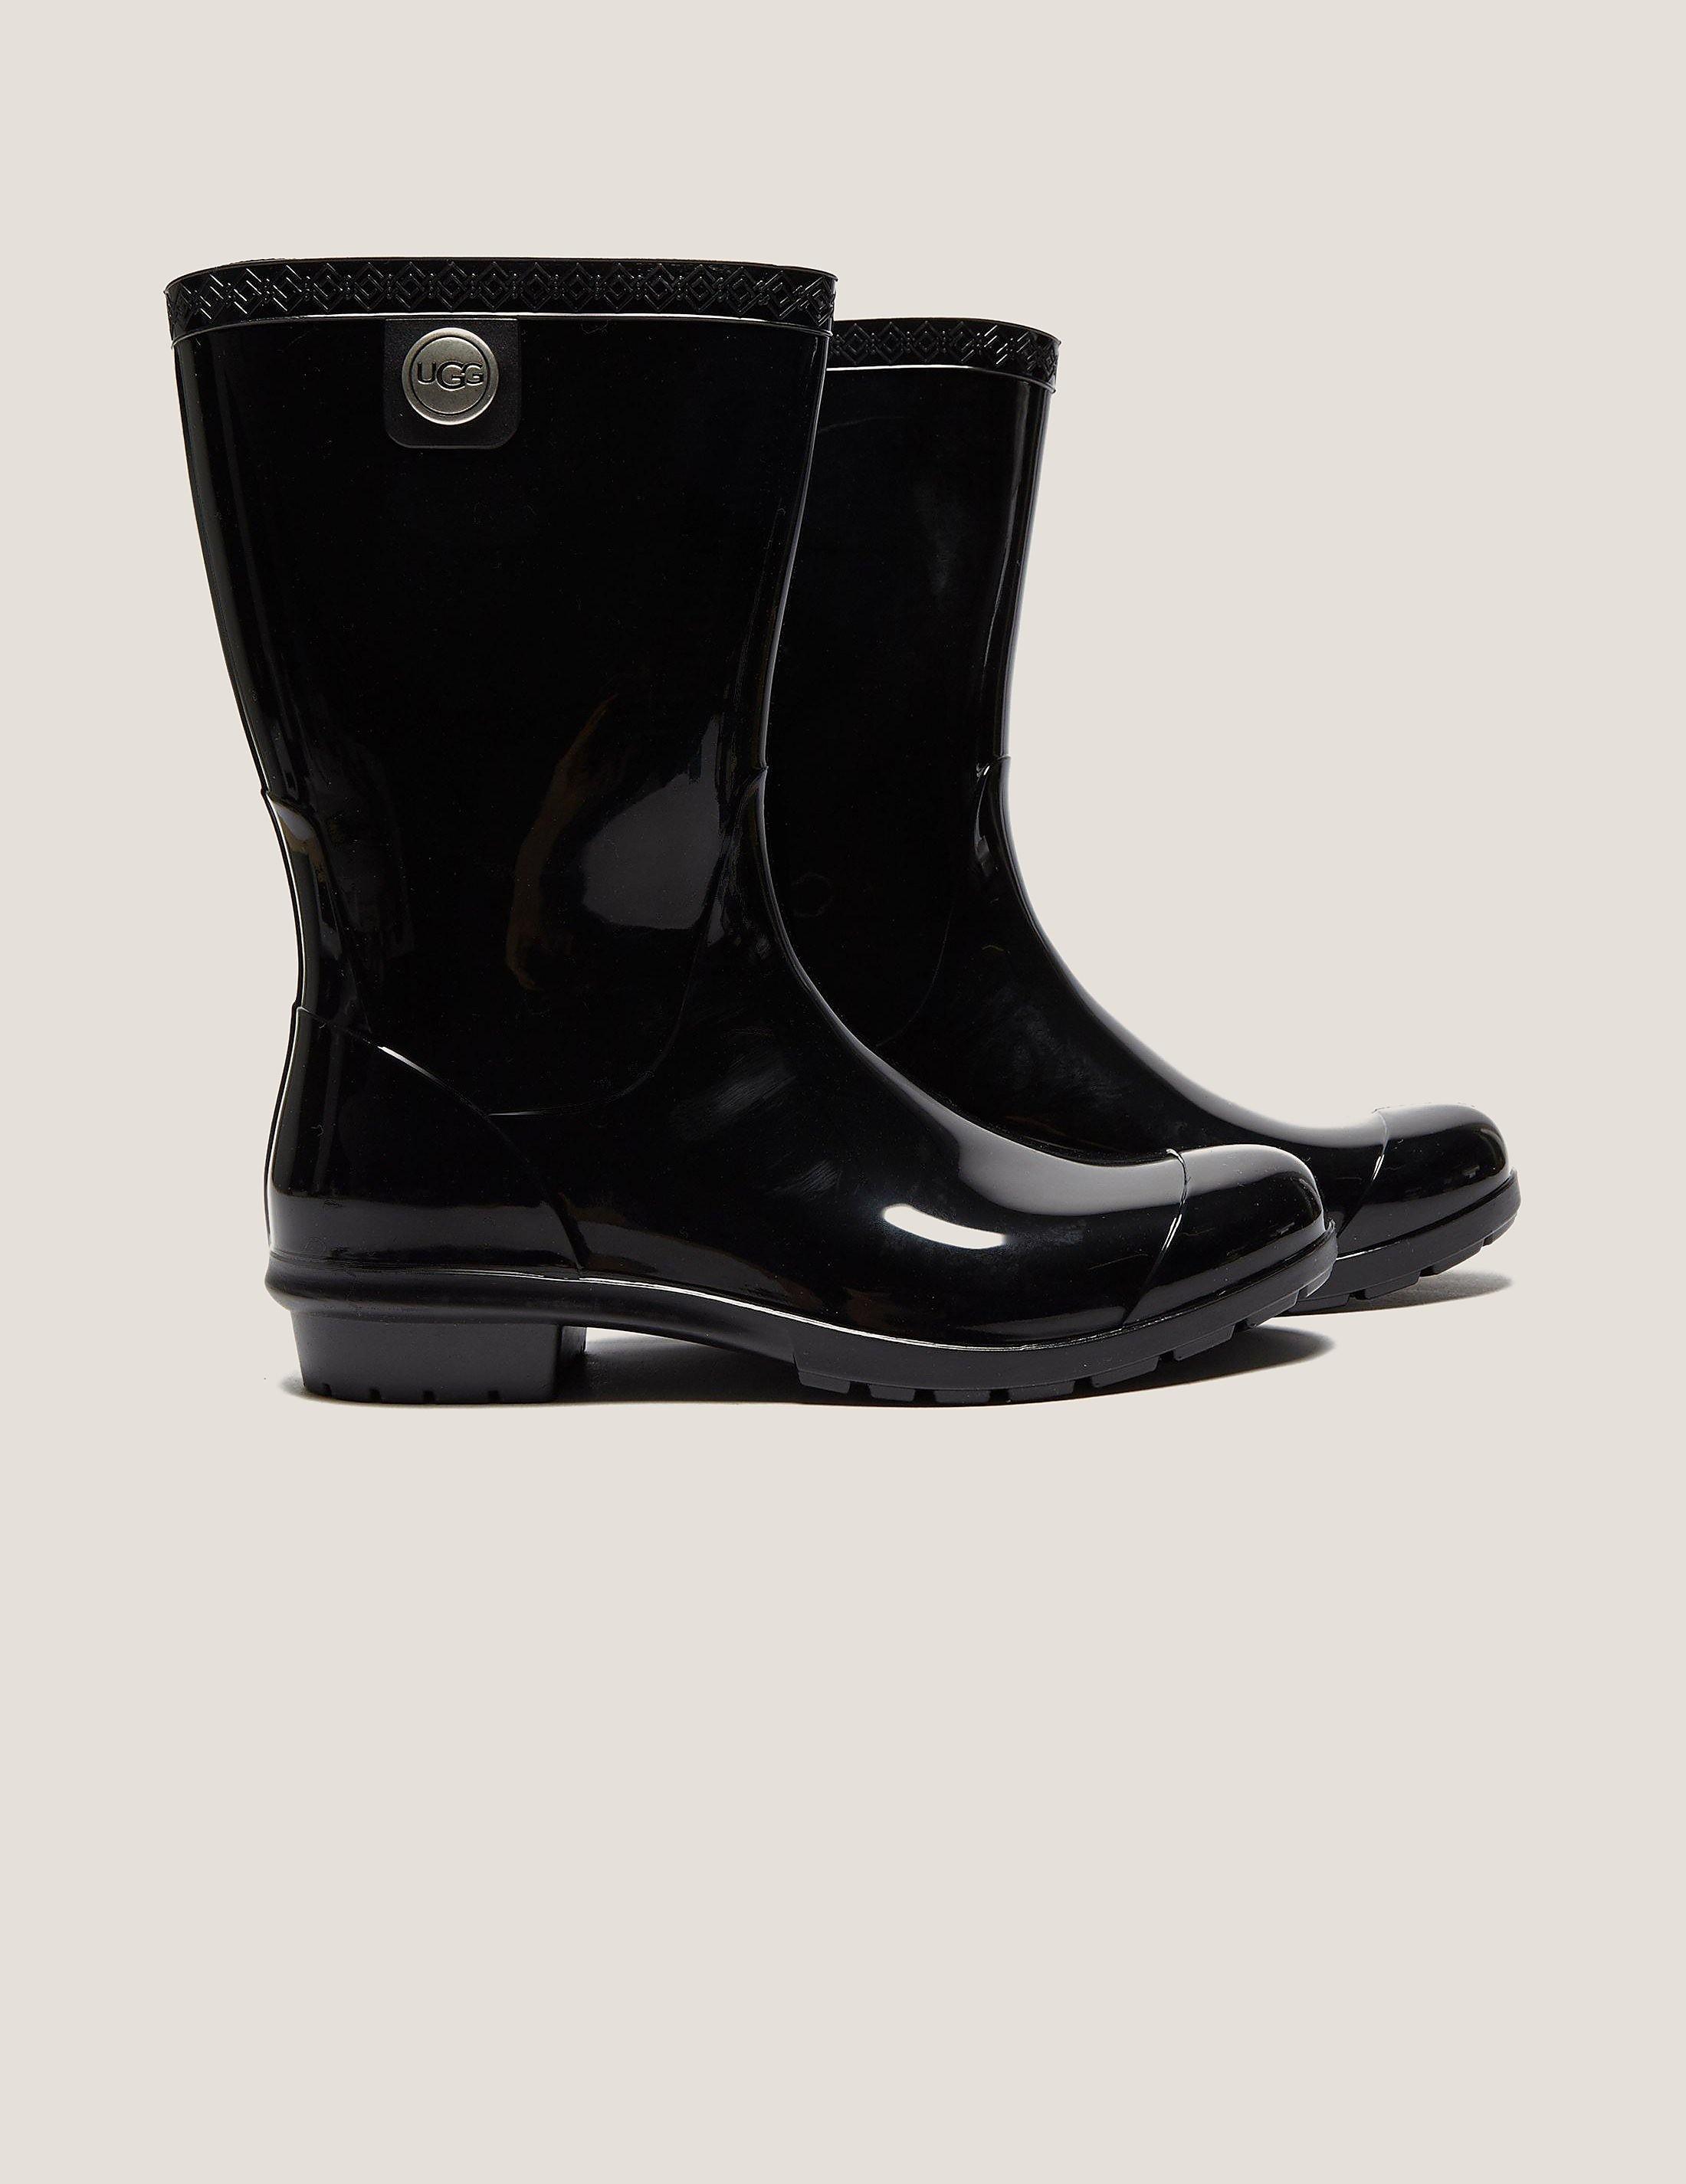 UGG Sienna Mid Rain Boot